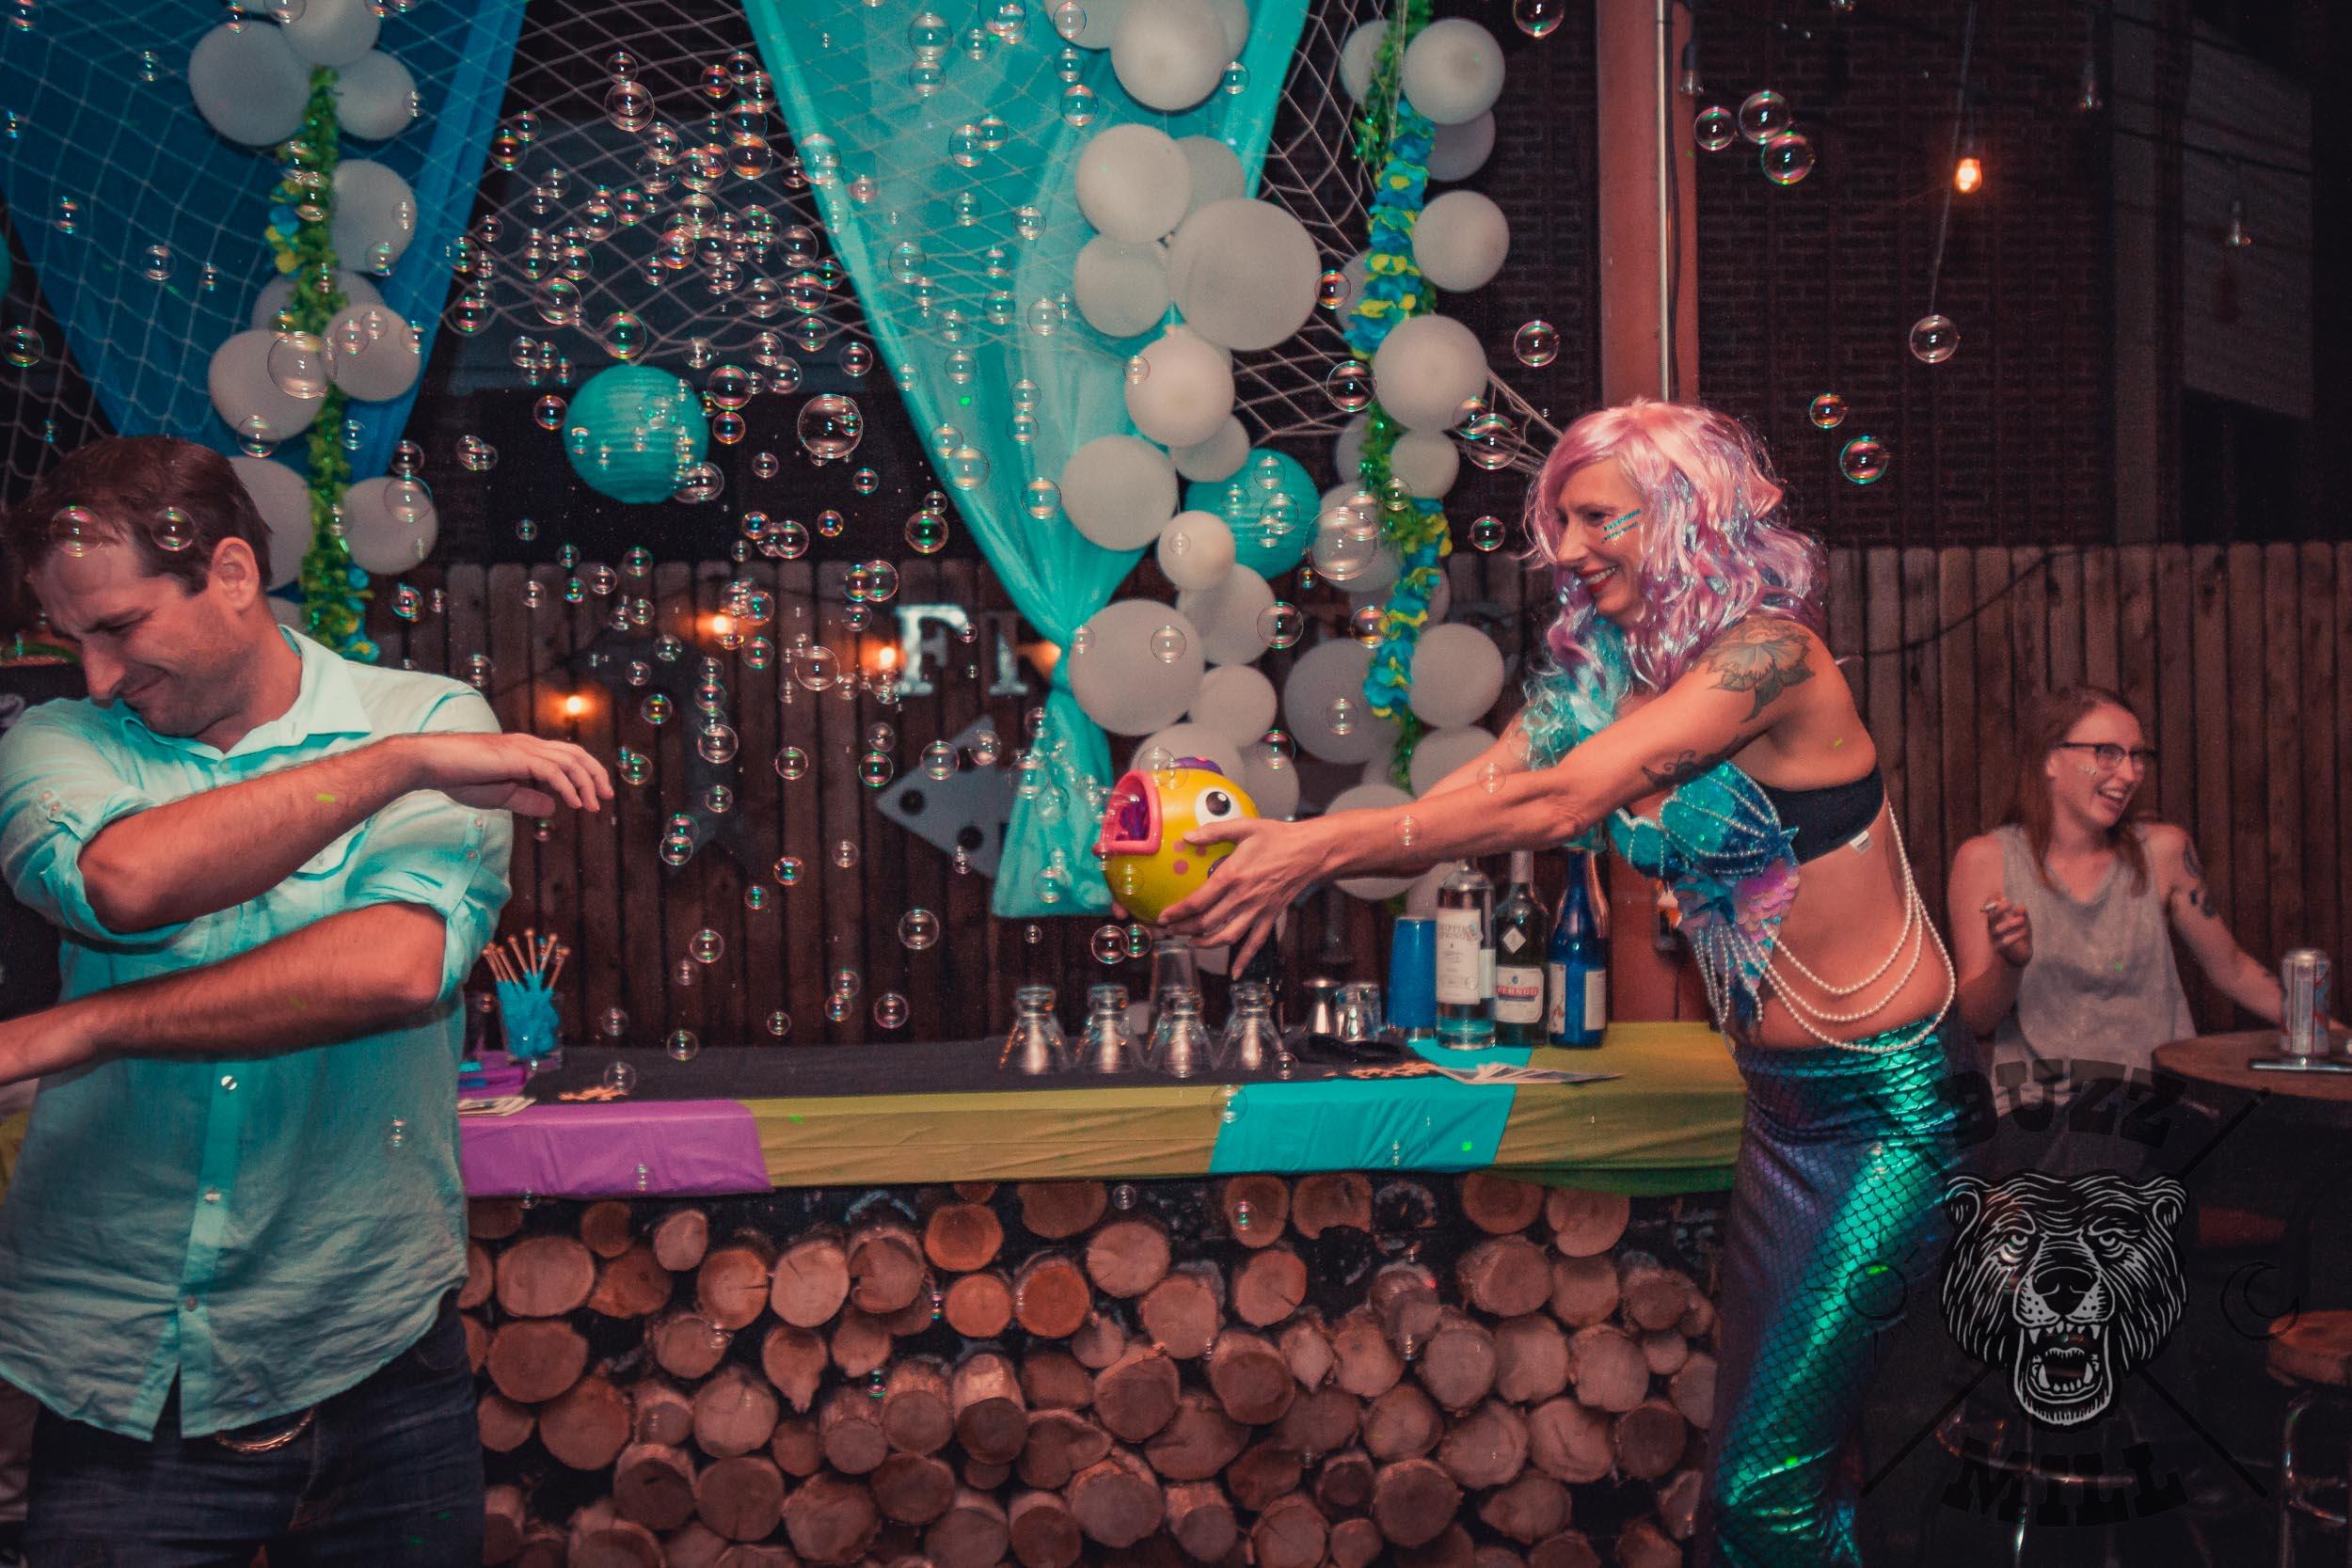 Buzz Mil, San marcos txSeptember 9th, 2017 - San Marcos annual mermaid bar crawl